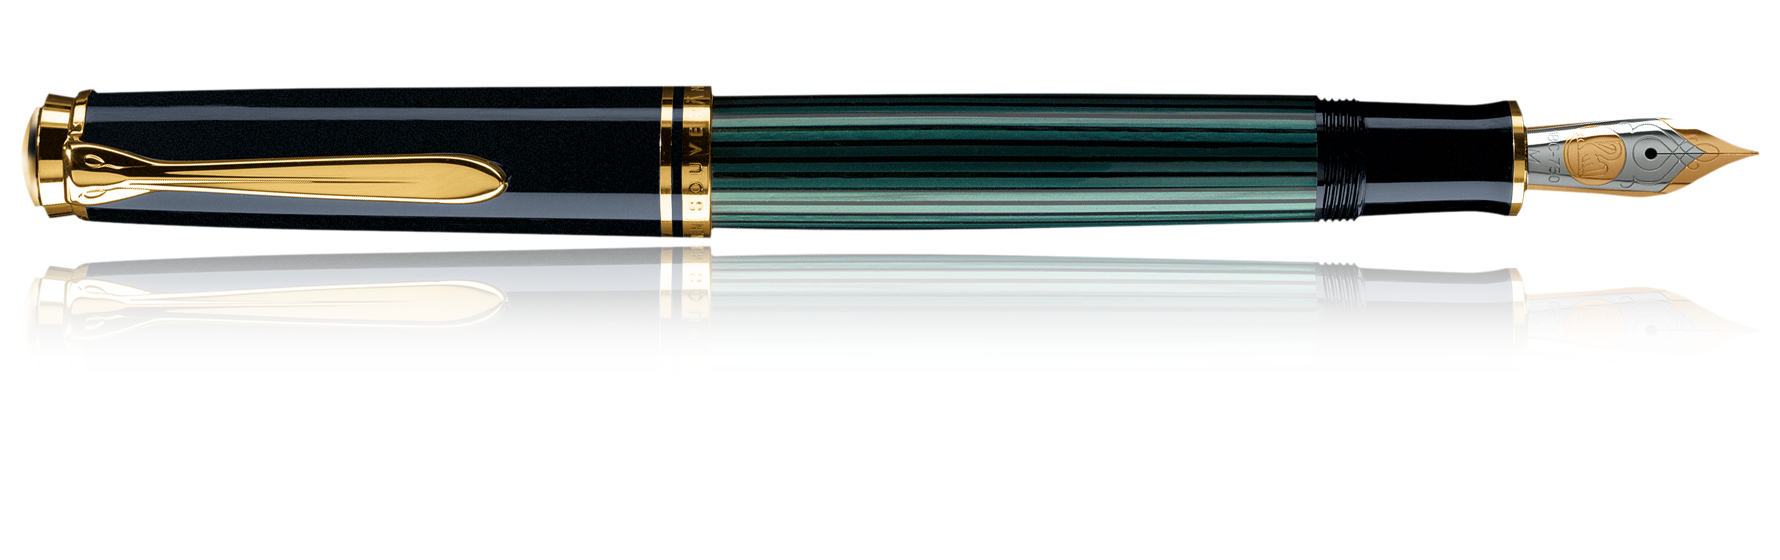 Pelikan Souverän M1000 - Schwarz - Gold - Grün - Blau - Gold - 1 Stück(e)